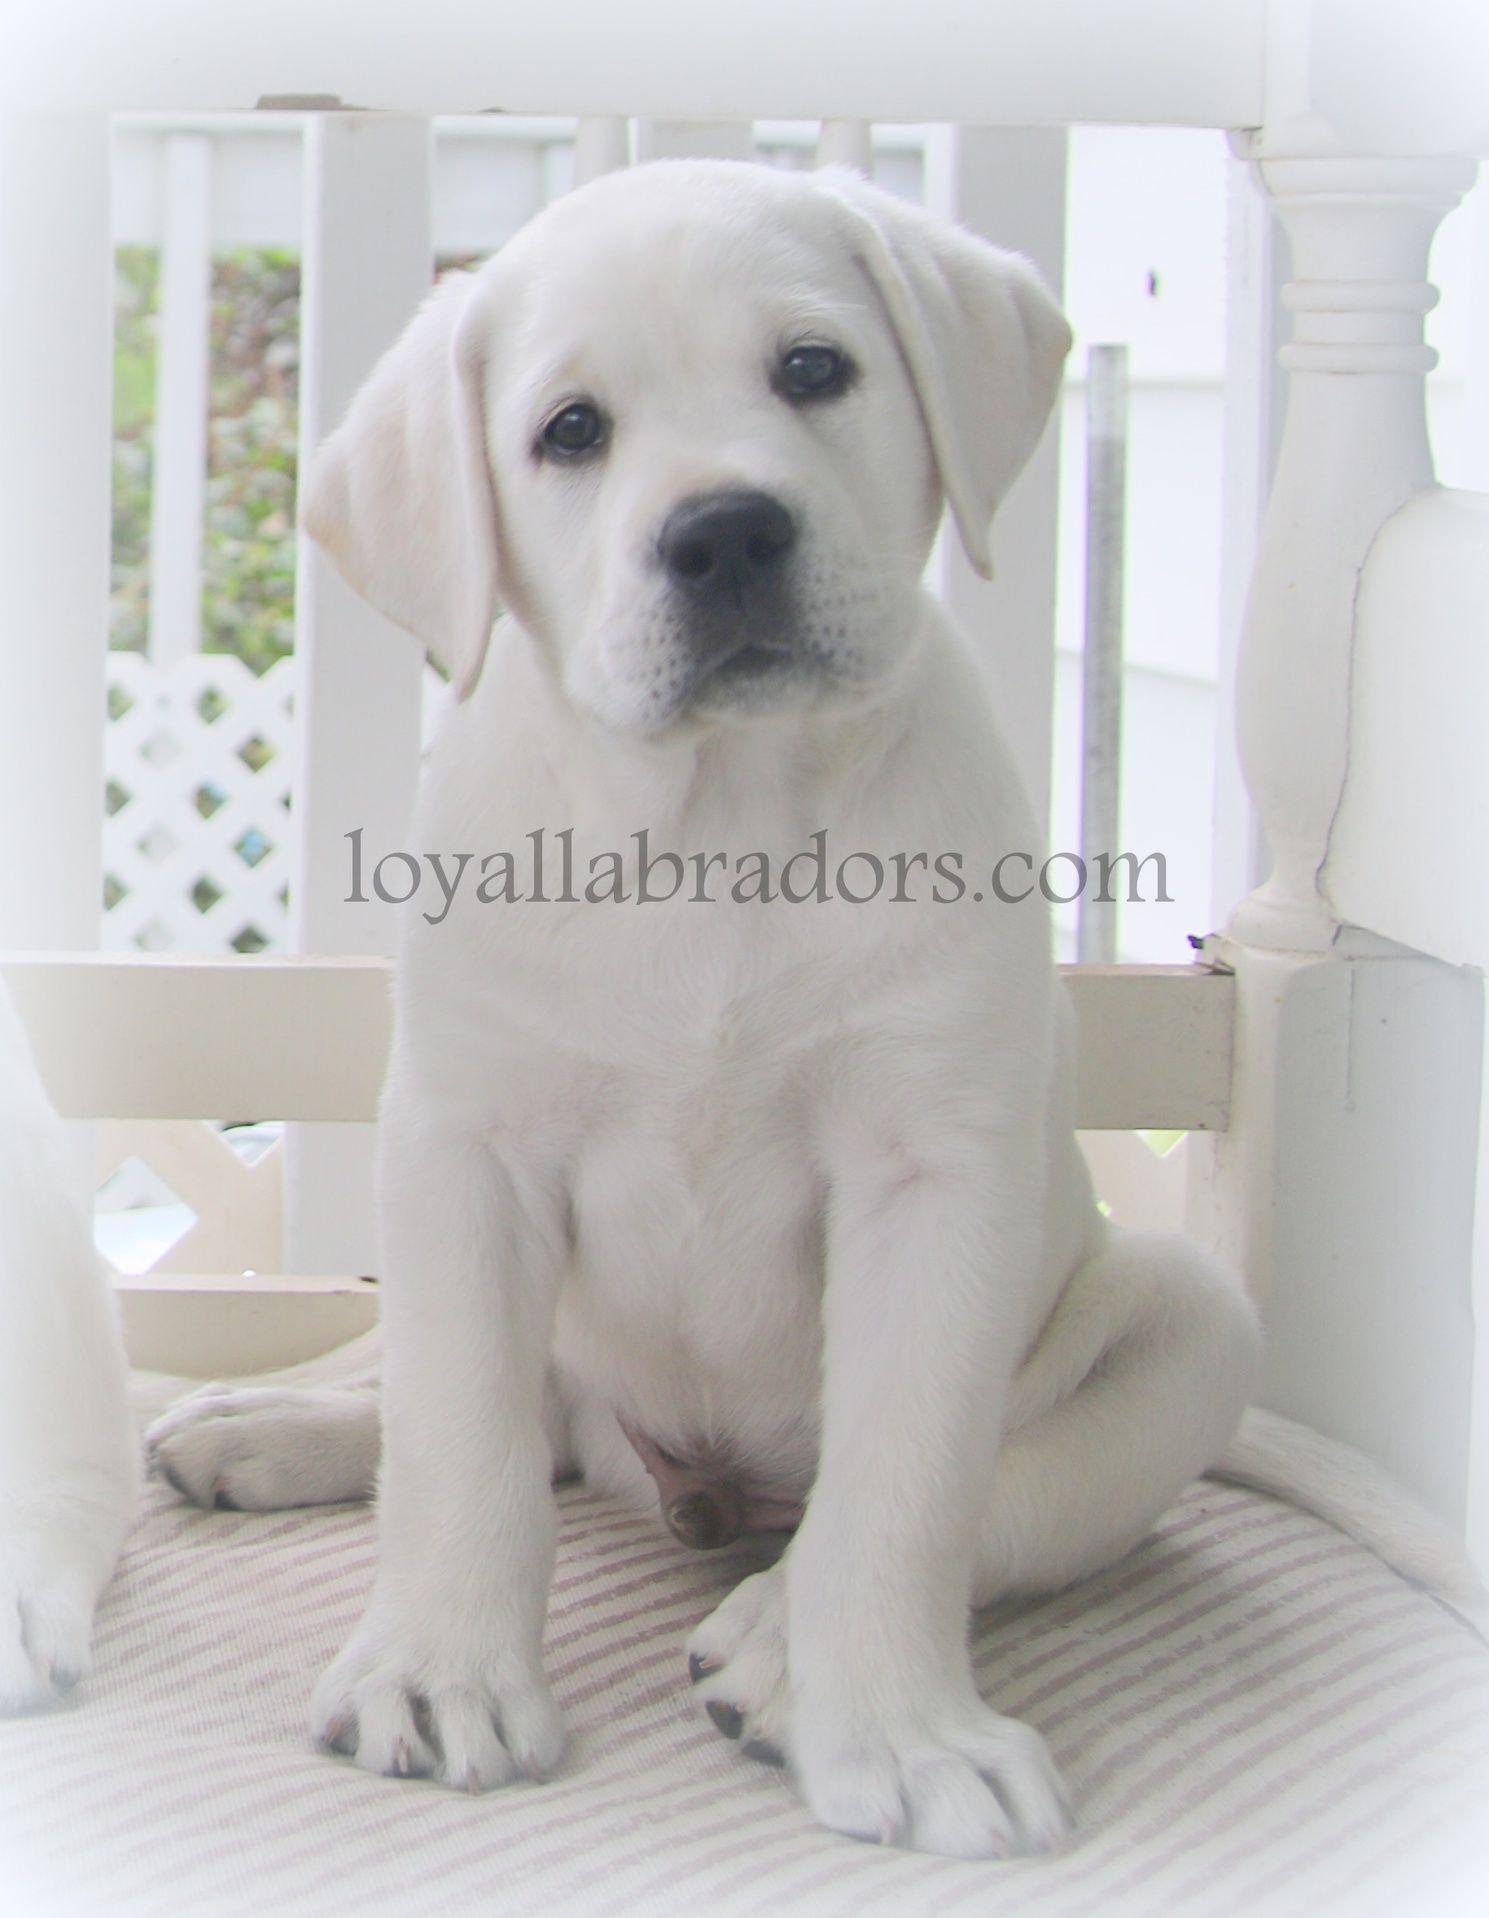 White English Lab Puppies White Labrador Retriever Puppies Our White Labrador Puppies For Sale Are From Lab Puppies White Lab Puppies White Labrador Puppy